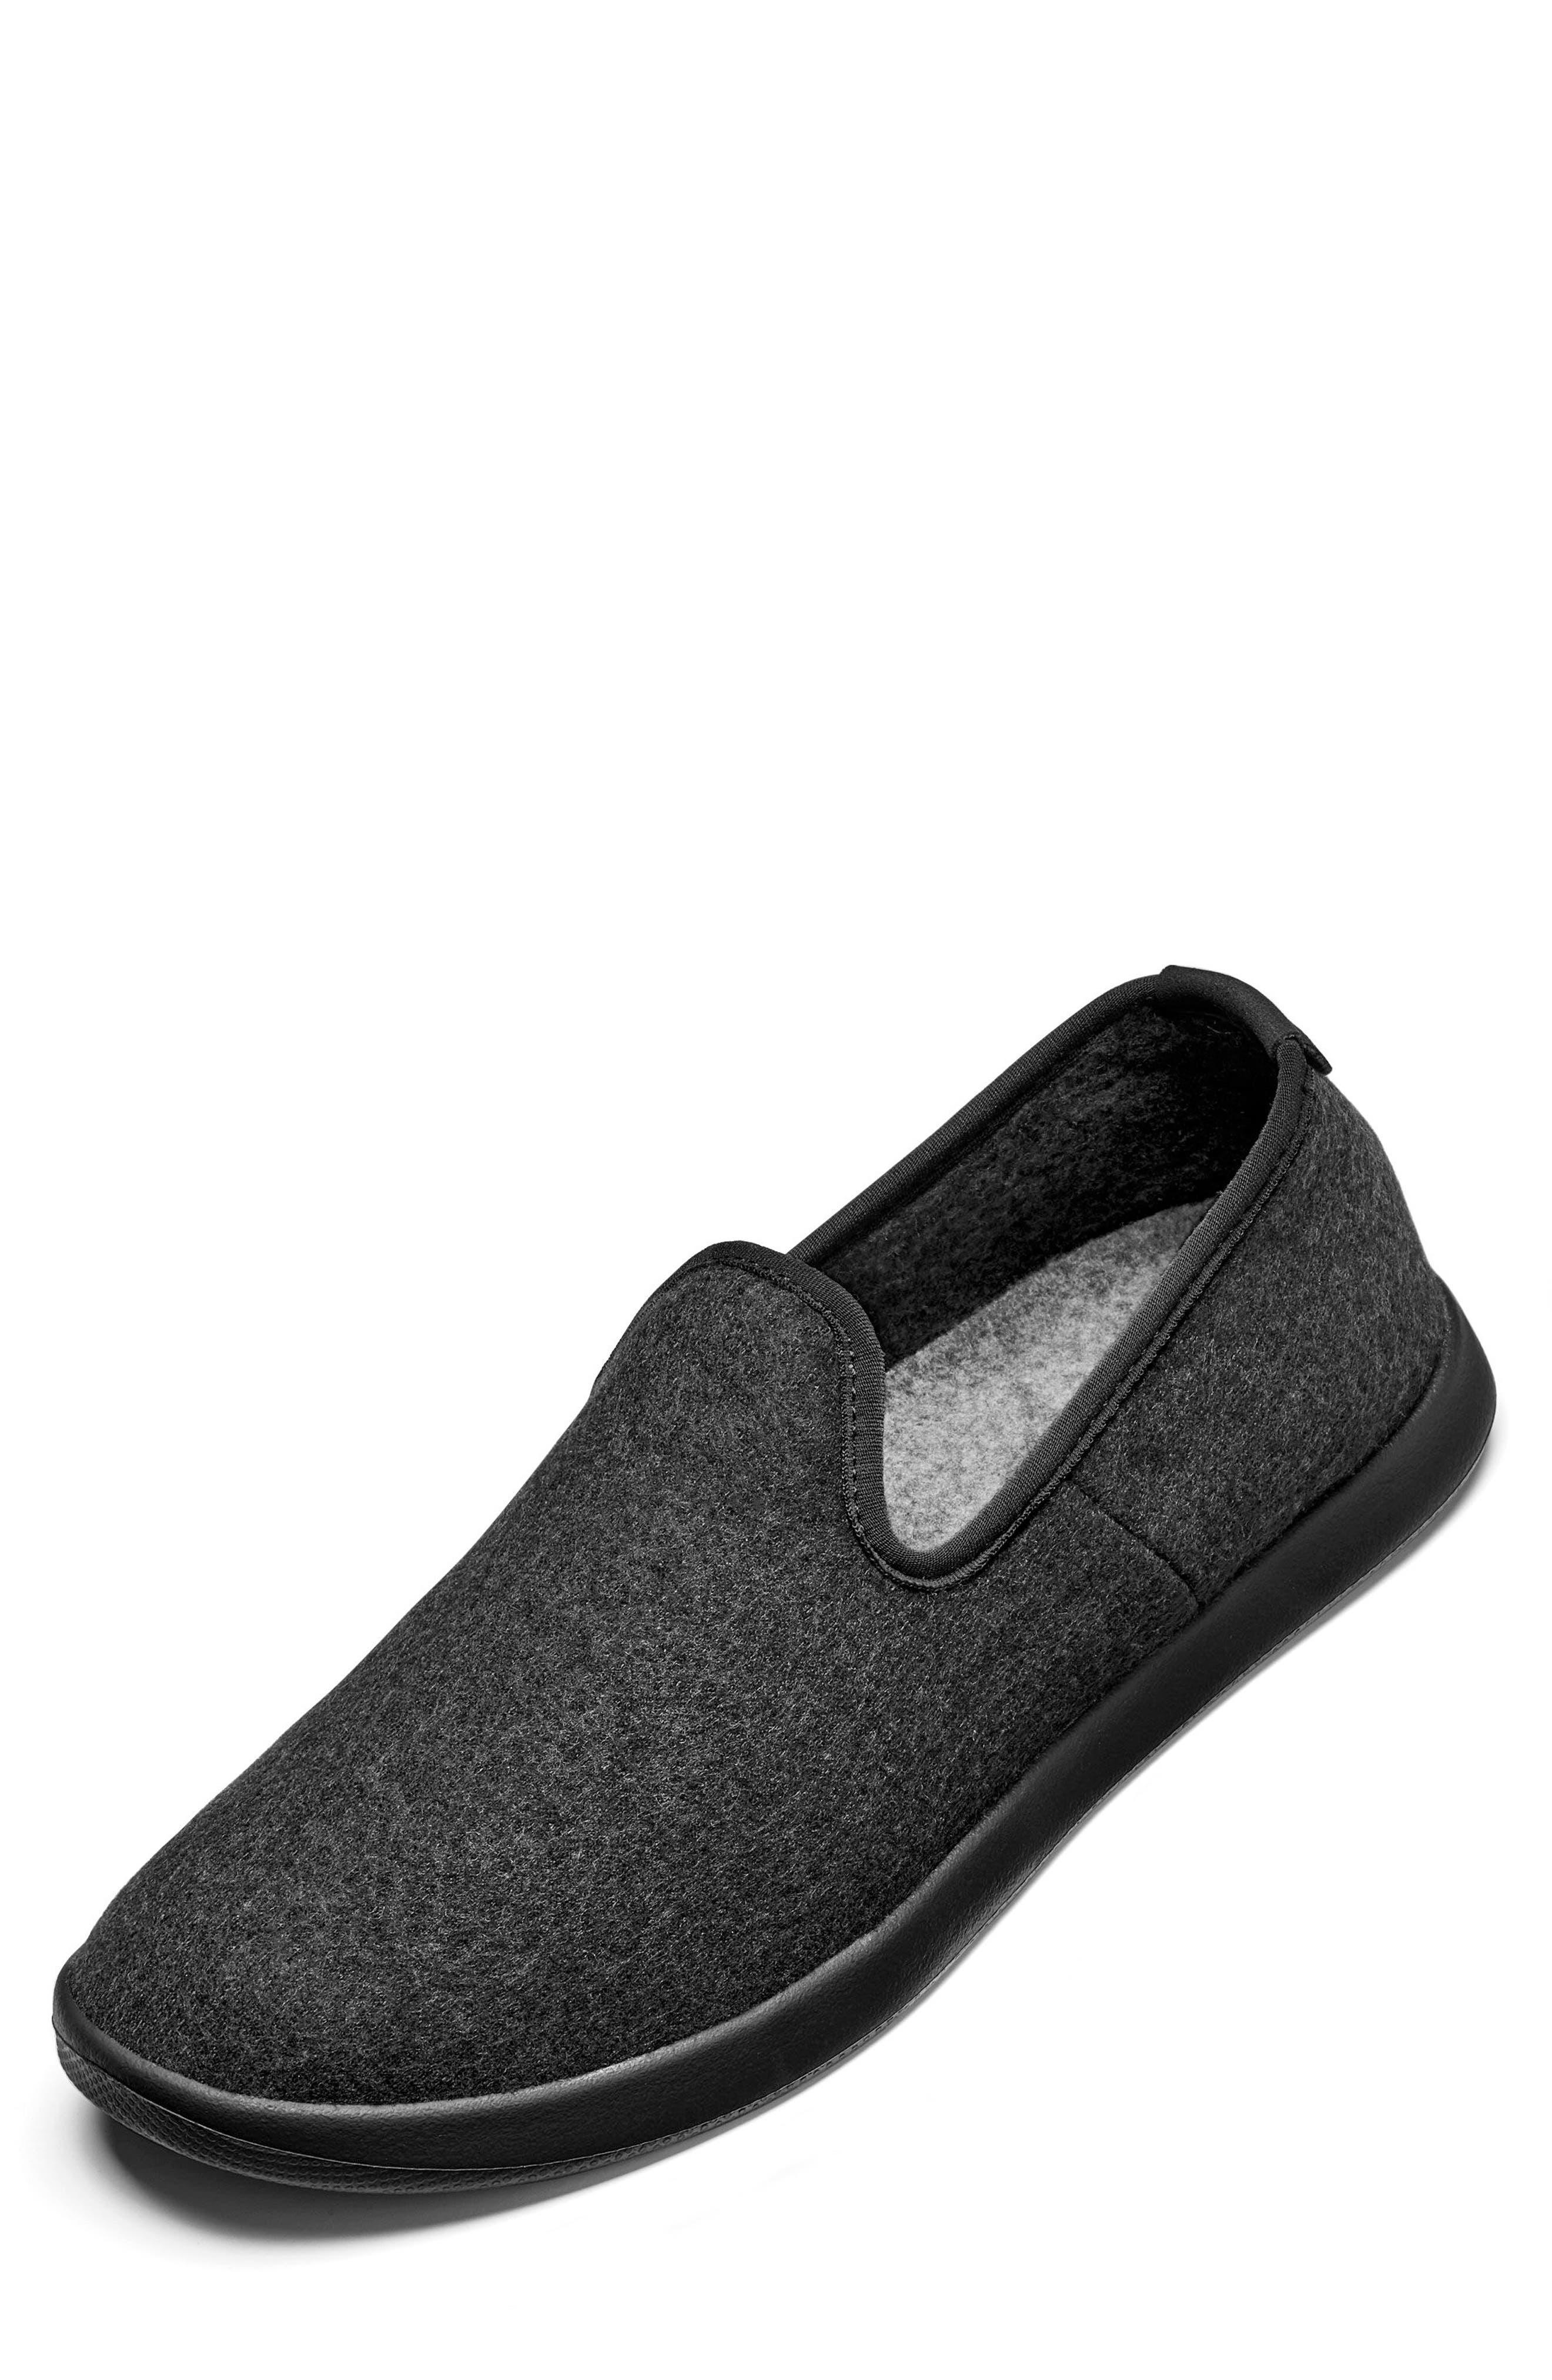 Wool Lounger,                         Main,                         color, Natural Black